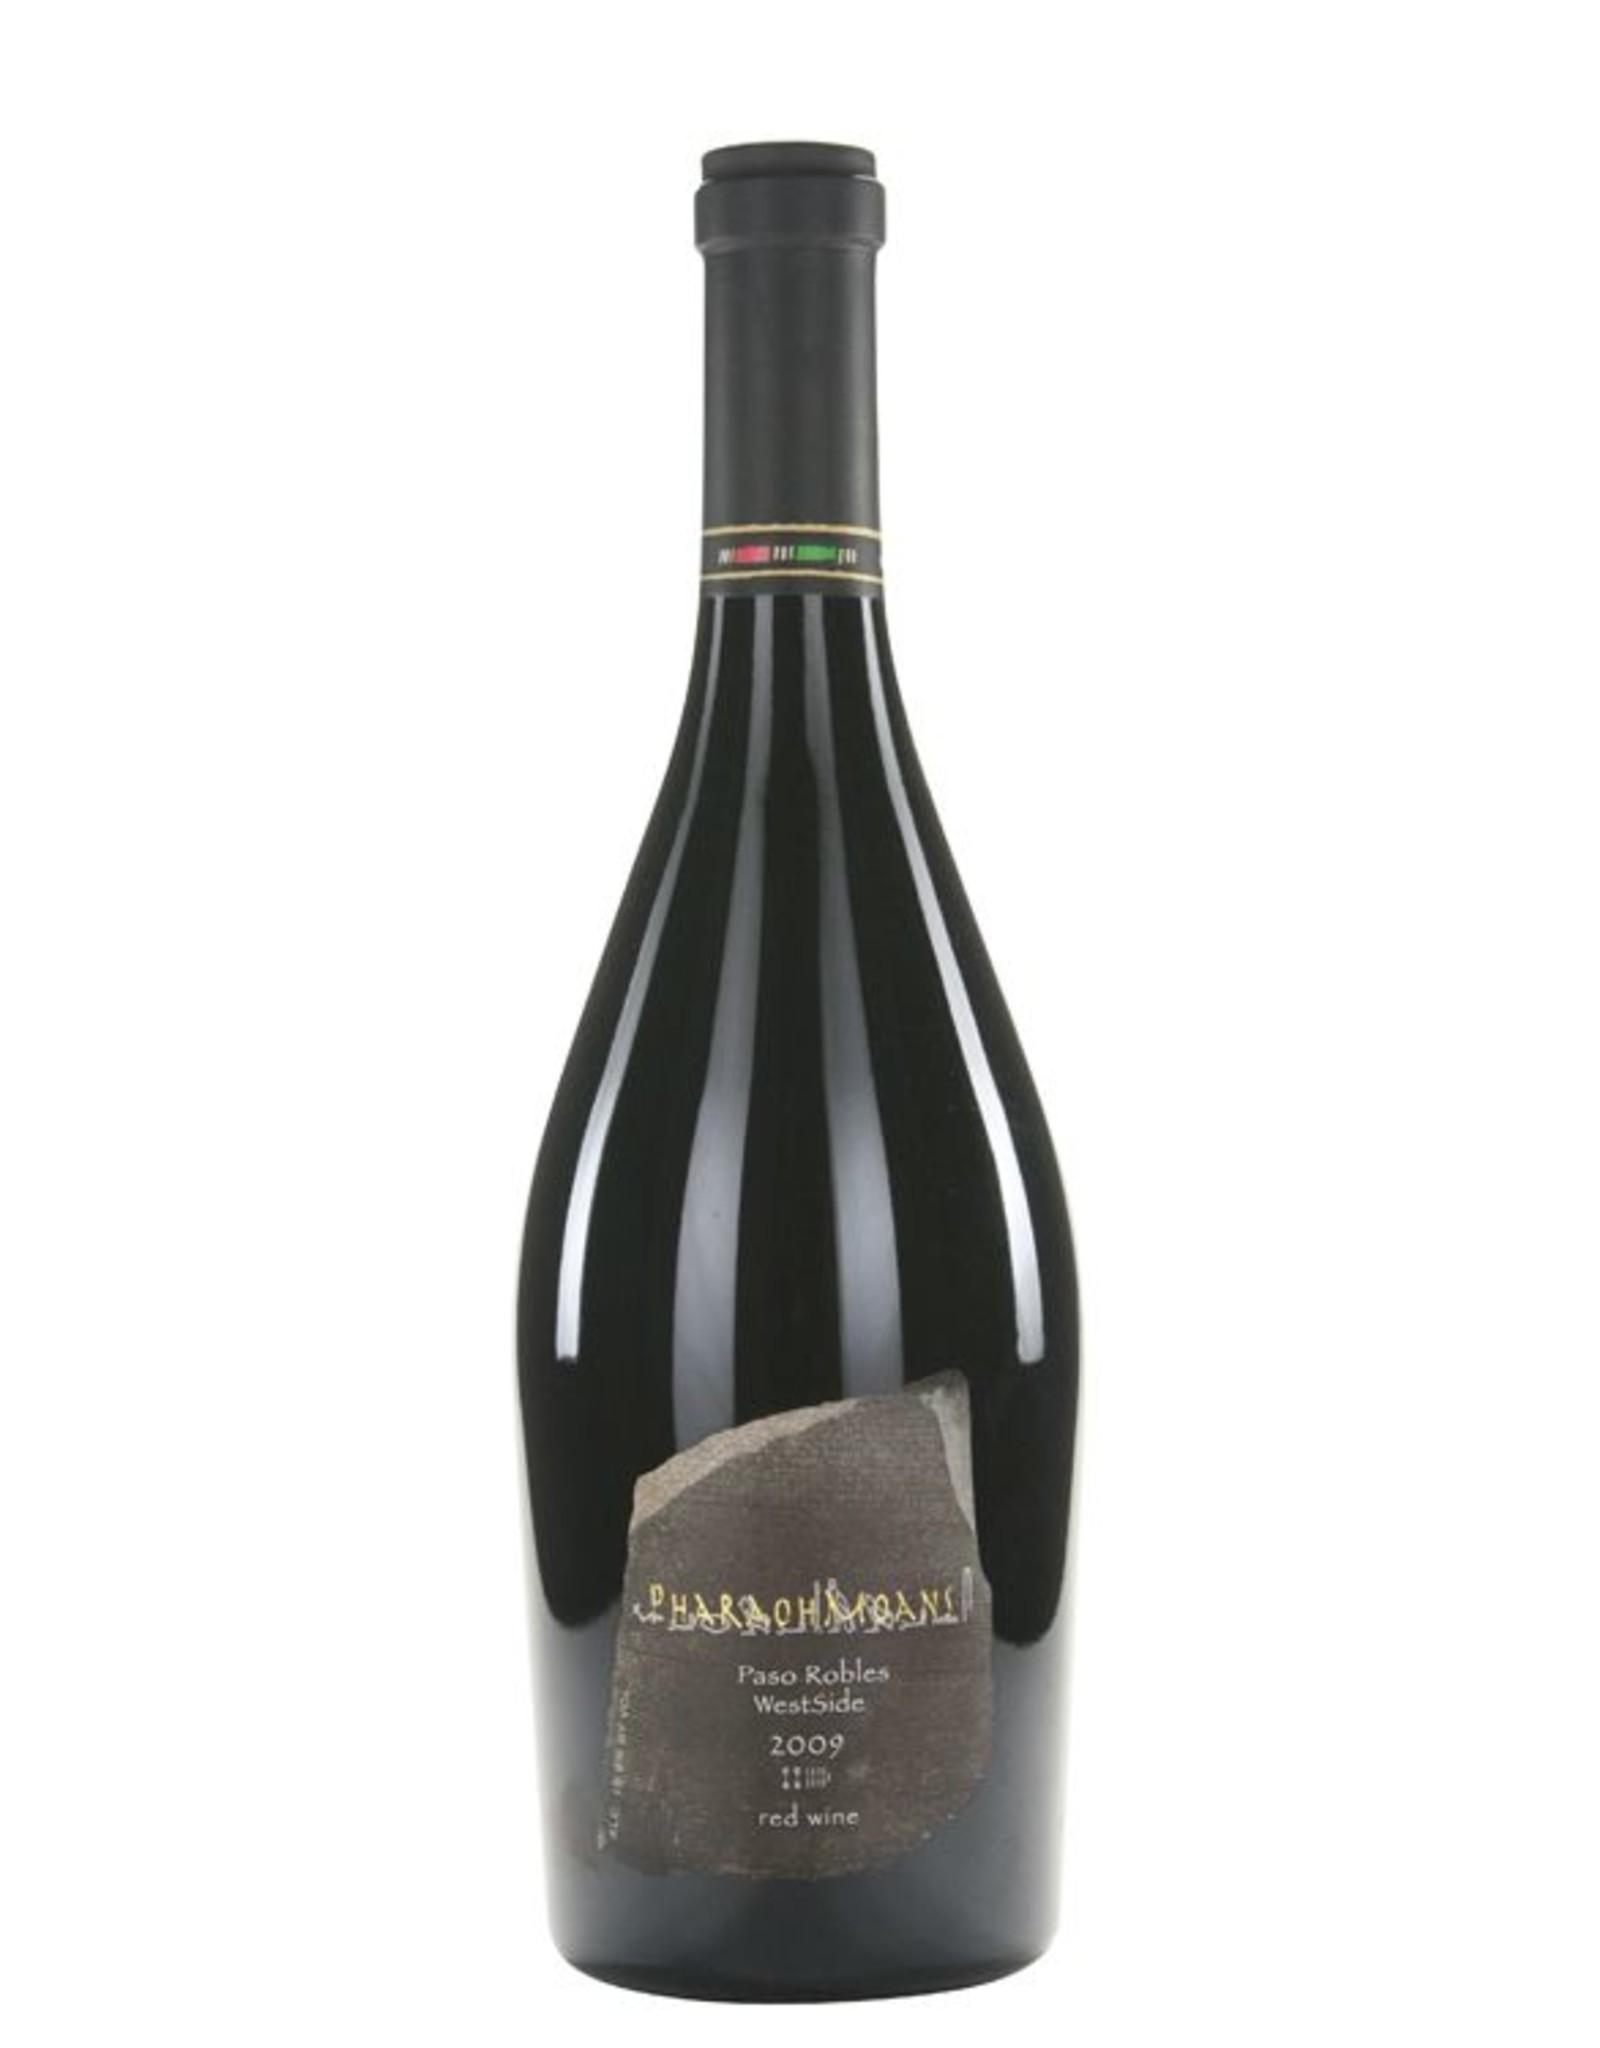 Red Wine 2014, Pharaoh Moans, Syrah, Paso Robles, Central Coast, California, 15.9% Alc, CT94